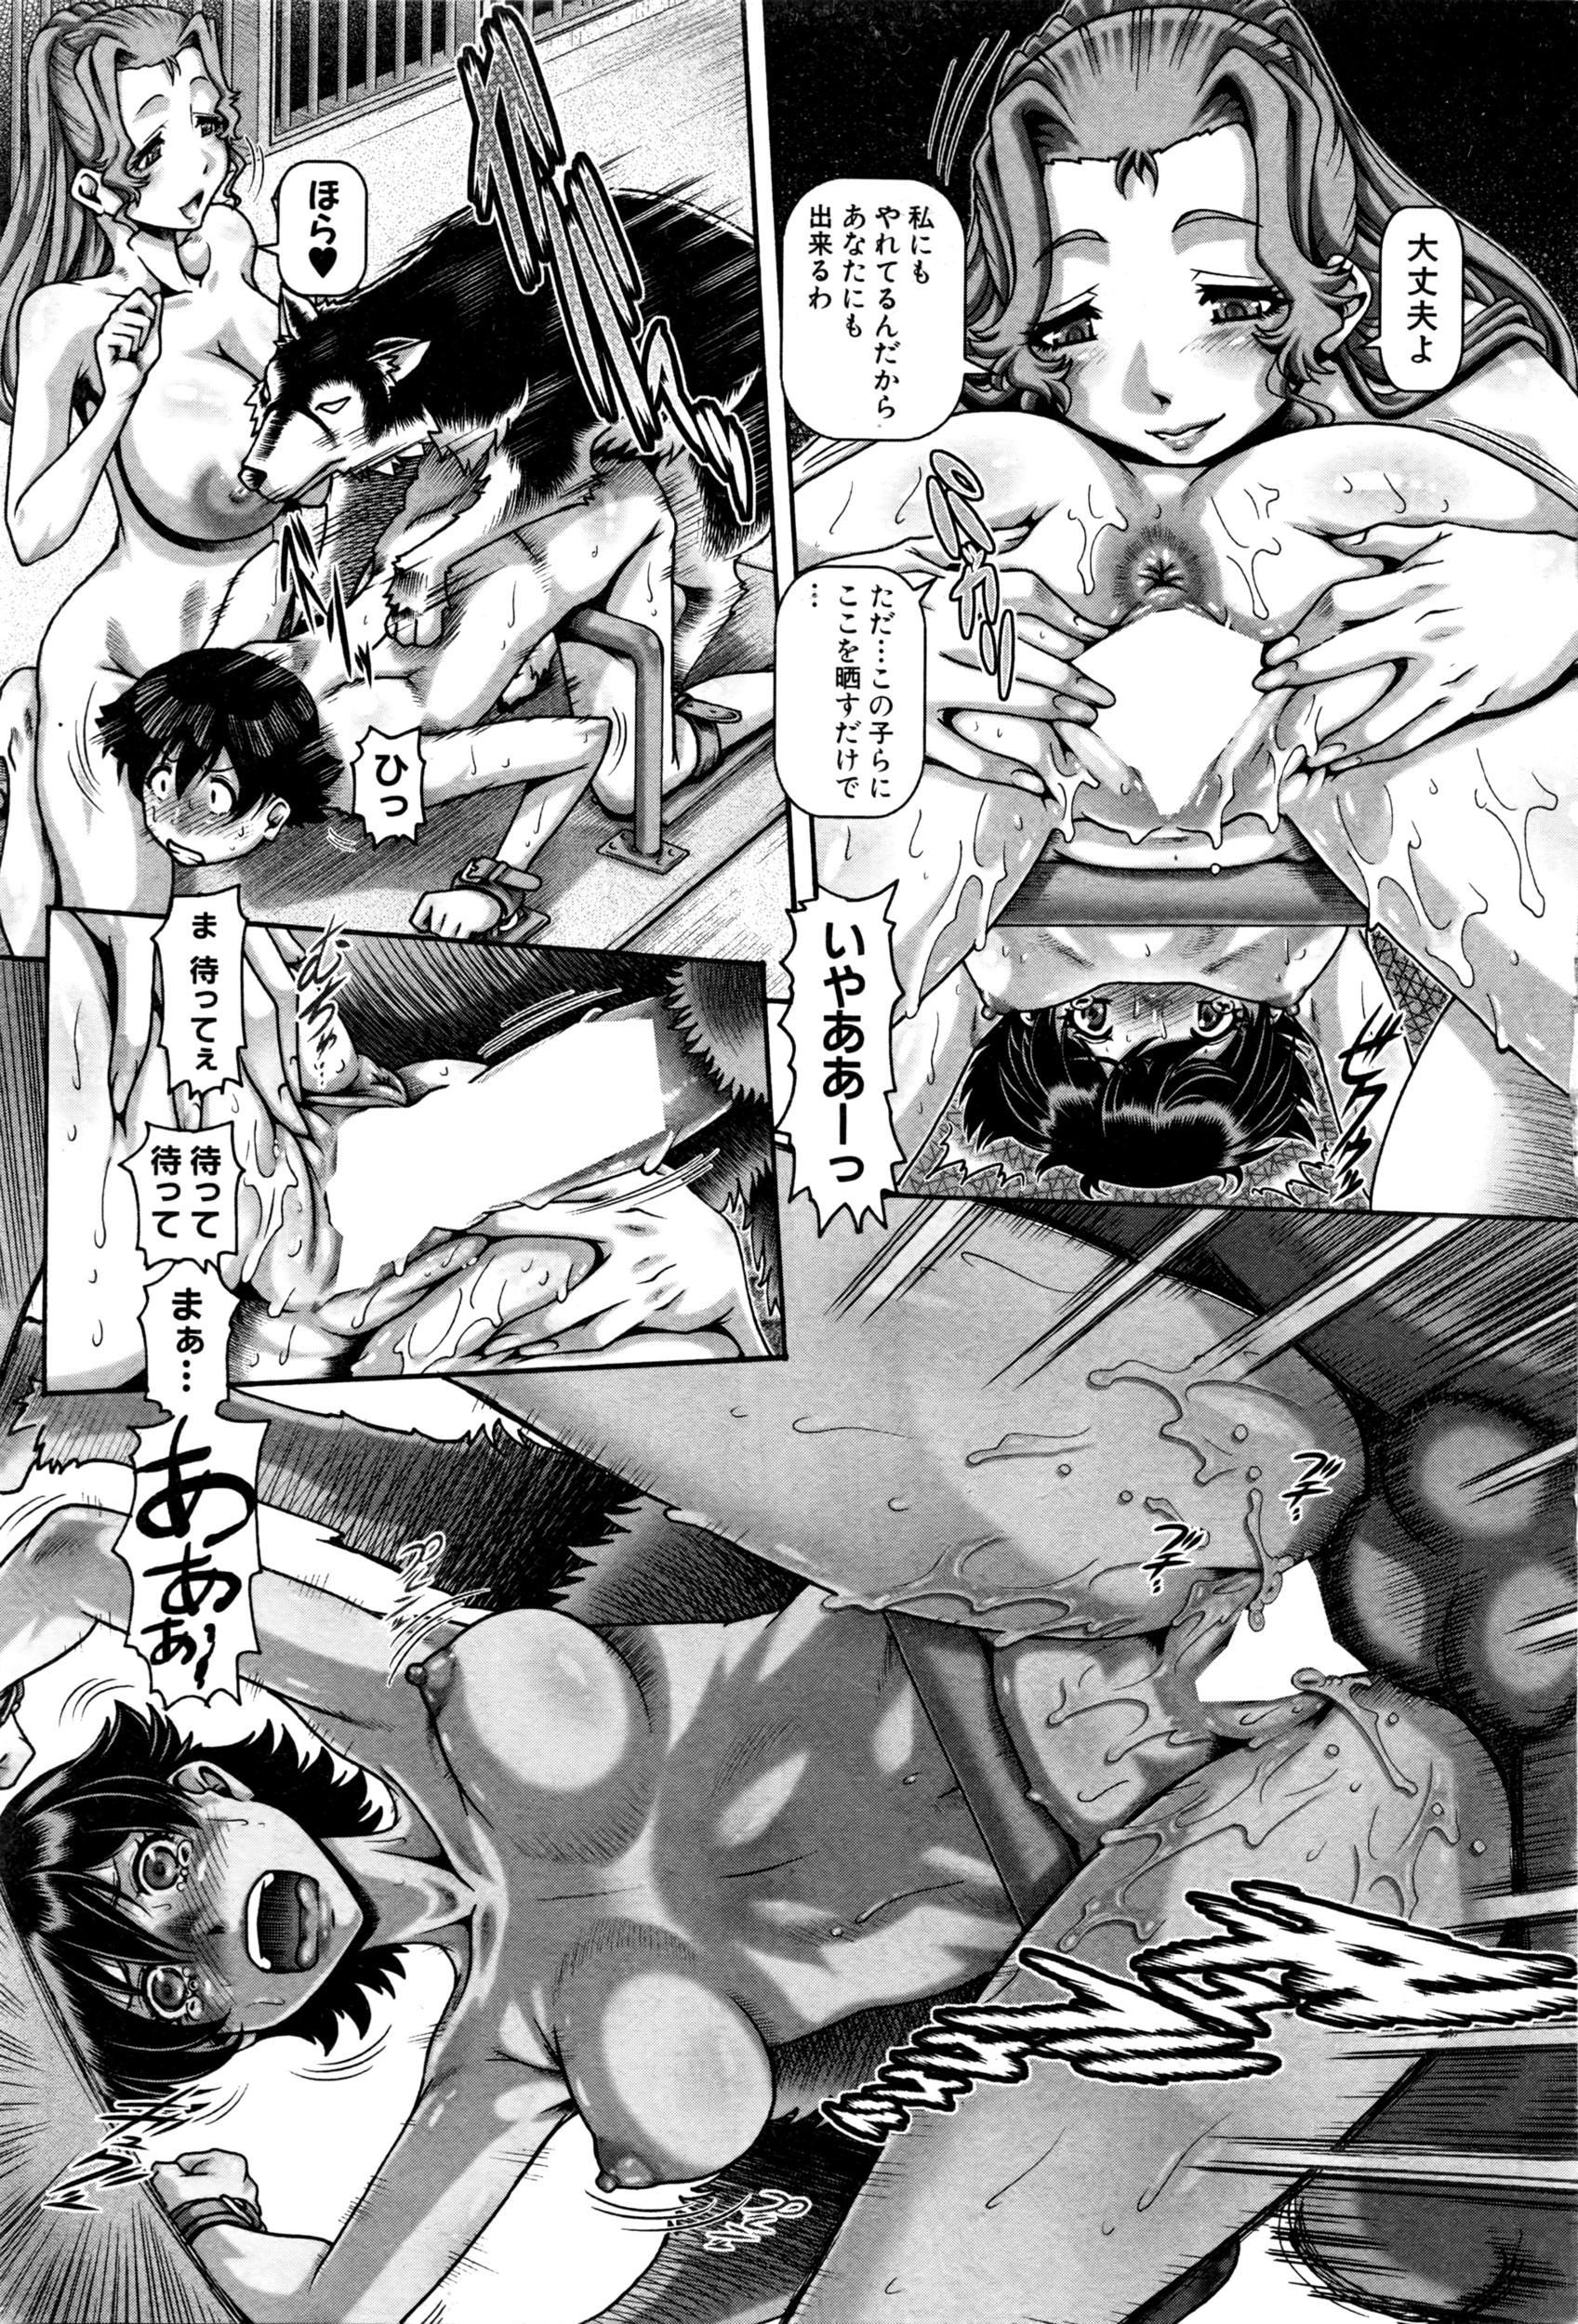 雌への付加家畜 - COMIC MILF Vol.30 COMIC 夢幻転生 2016年6月号増刊 14